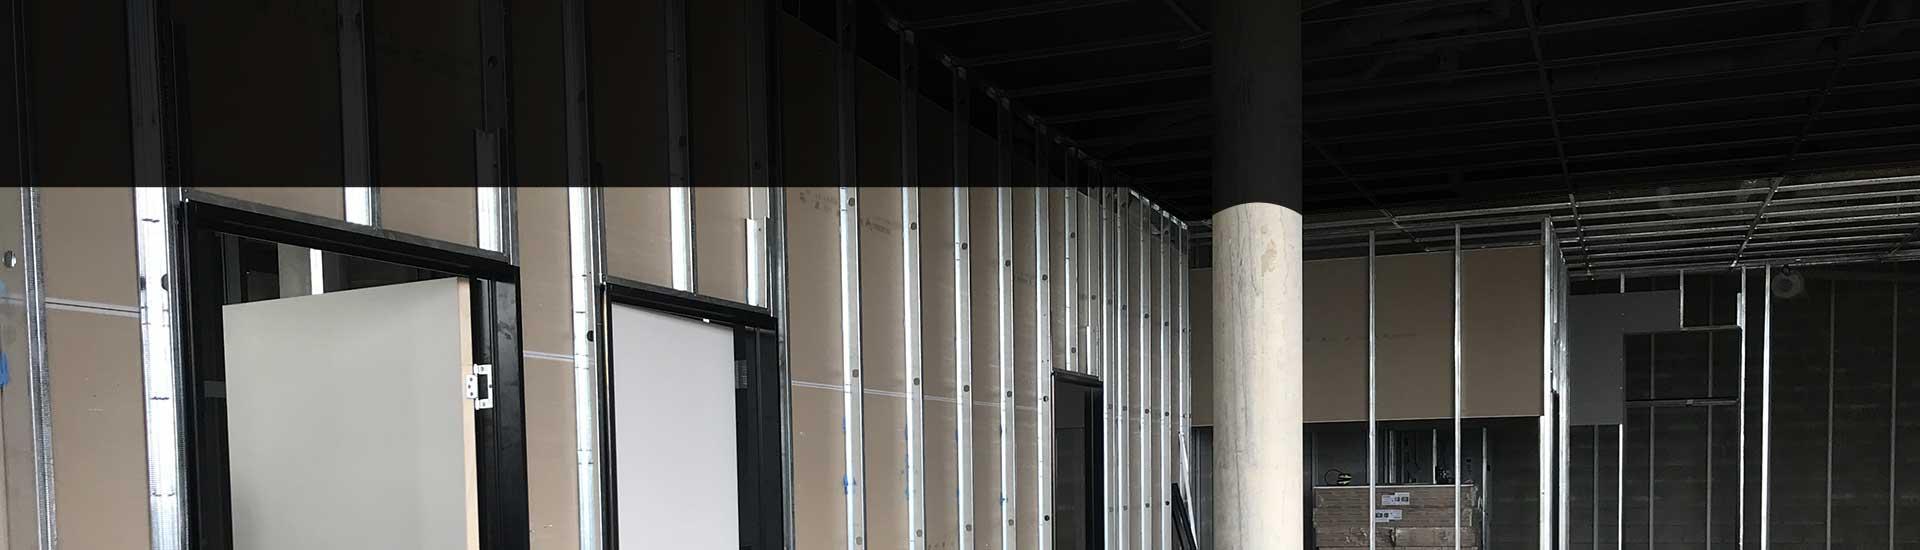 commercial pre tenancy review